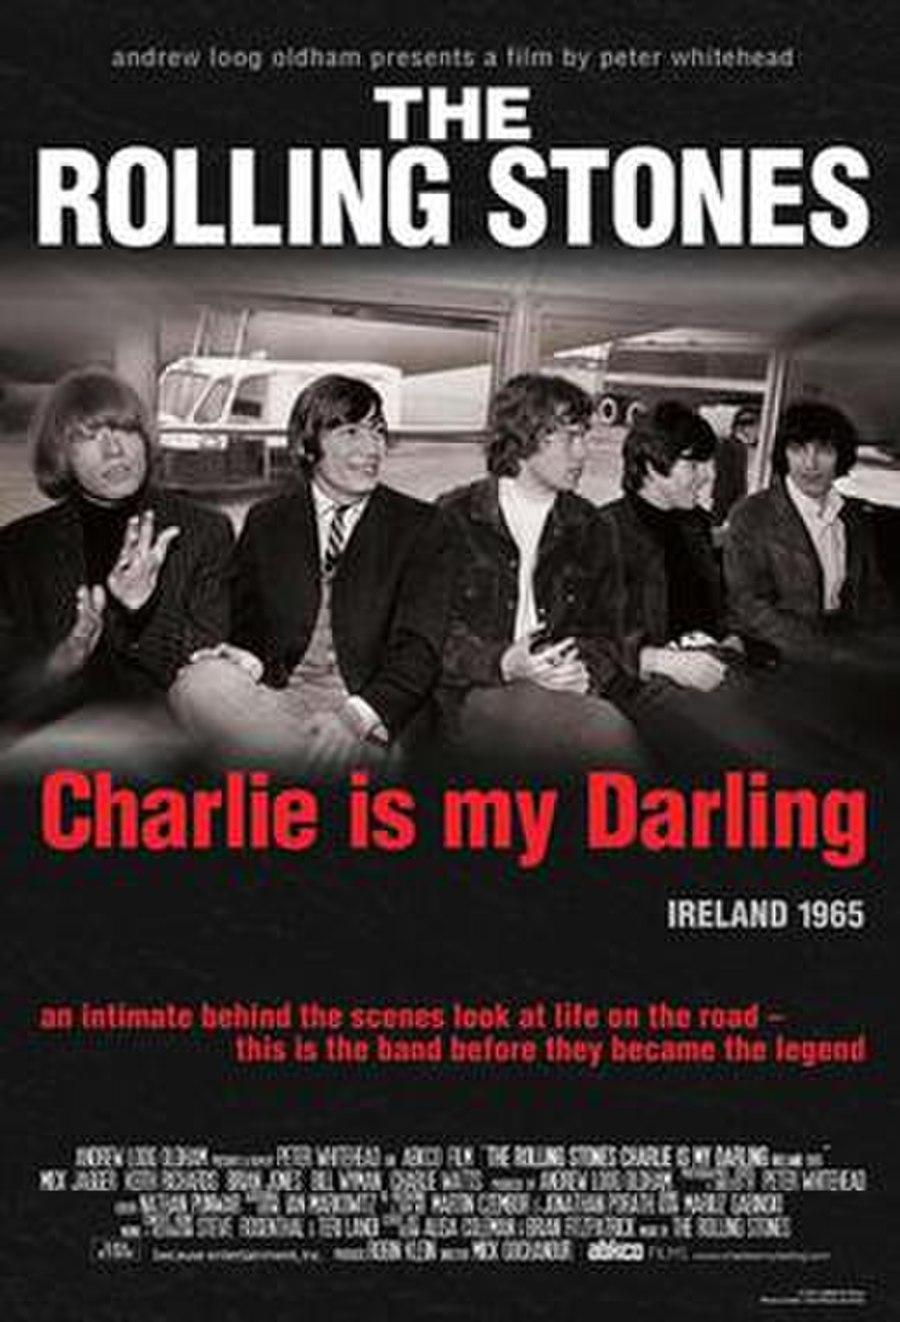 Charlie Is My Darling – Ireland 1965